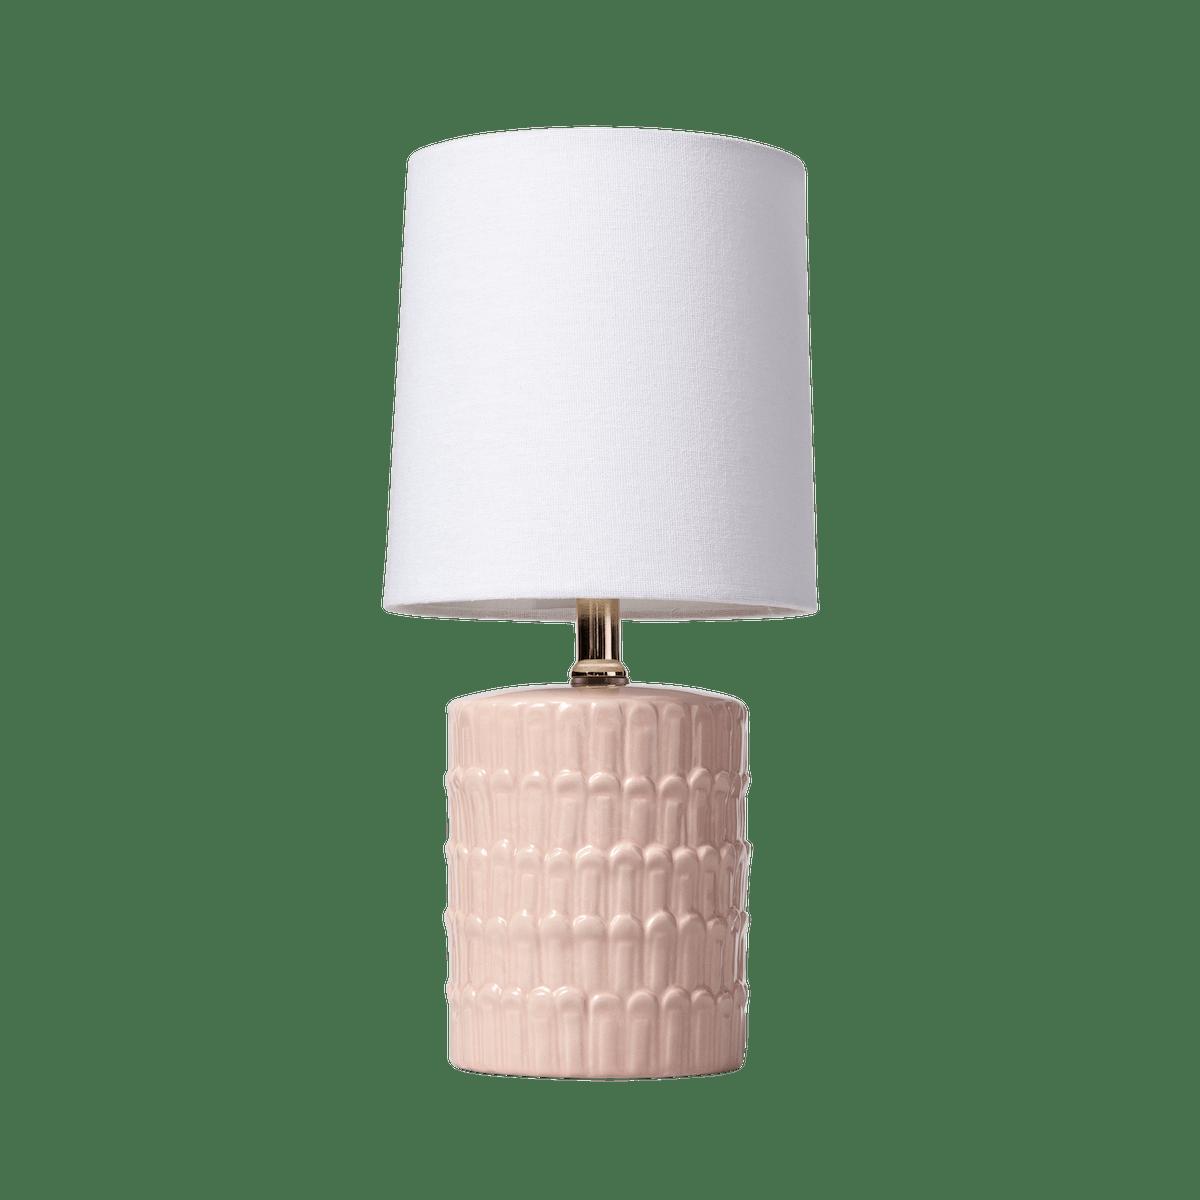 Ceramic Mini Table Lamp (Lamp Only) - Opalhouse™